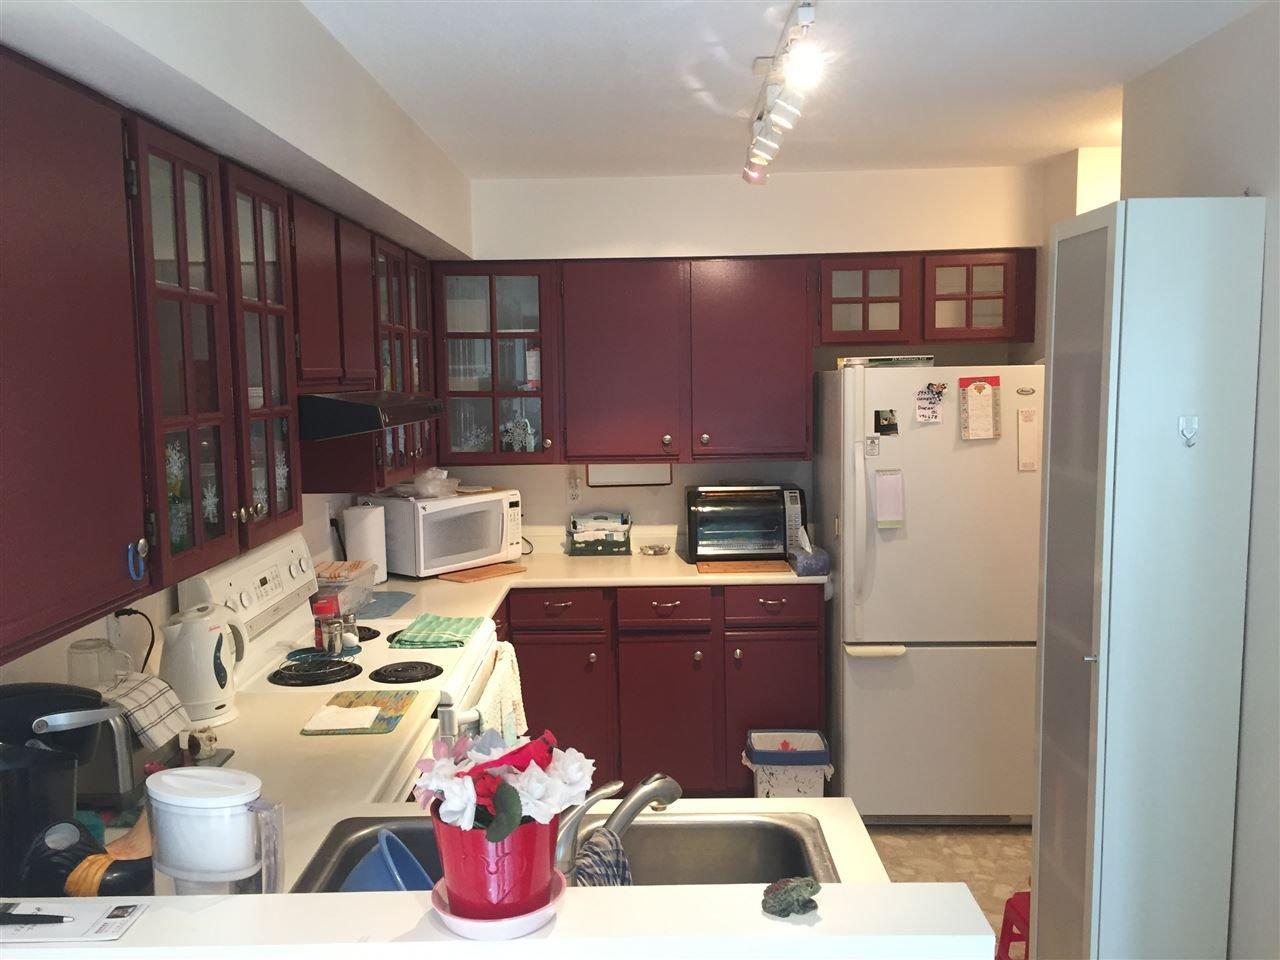 Photo 3: Photos: 219 4889 53 STREET in Delta: Hawthorne Condo for sale (Ladner)  : MLS®# R2243901